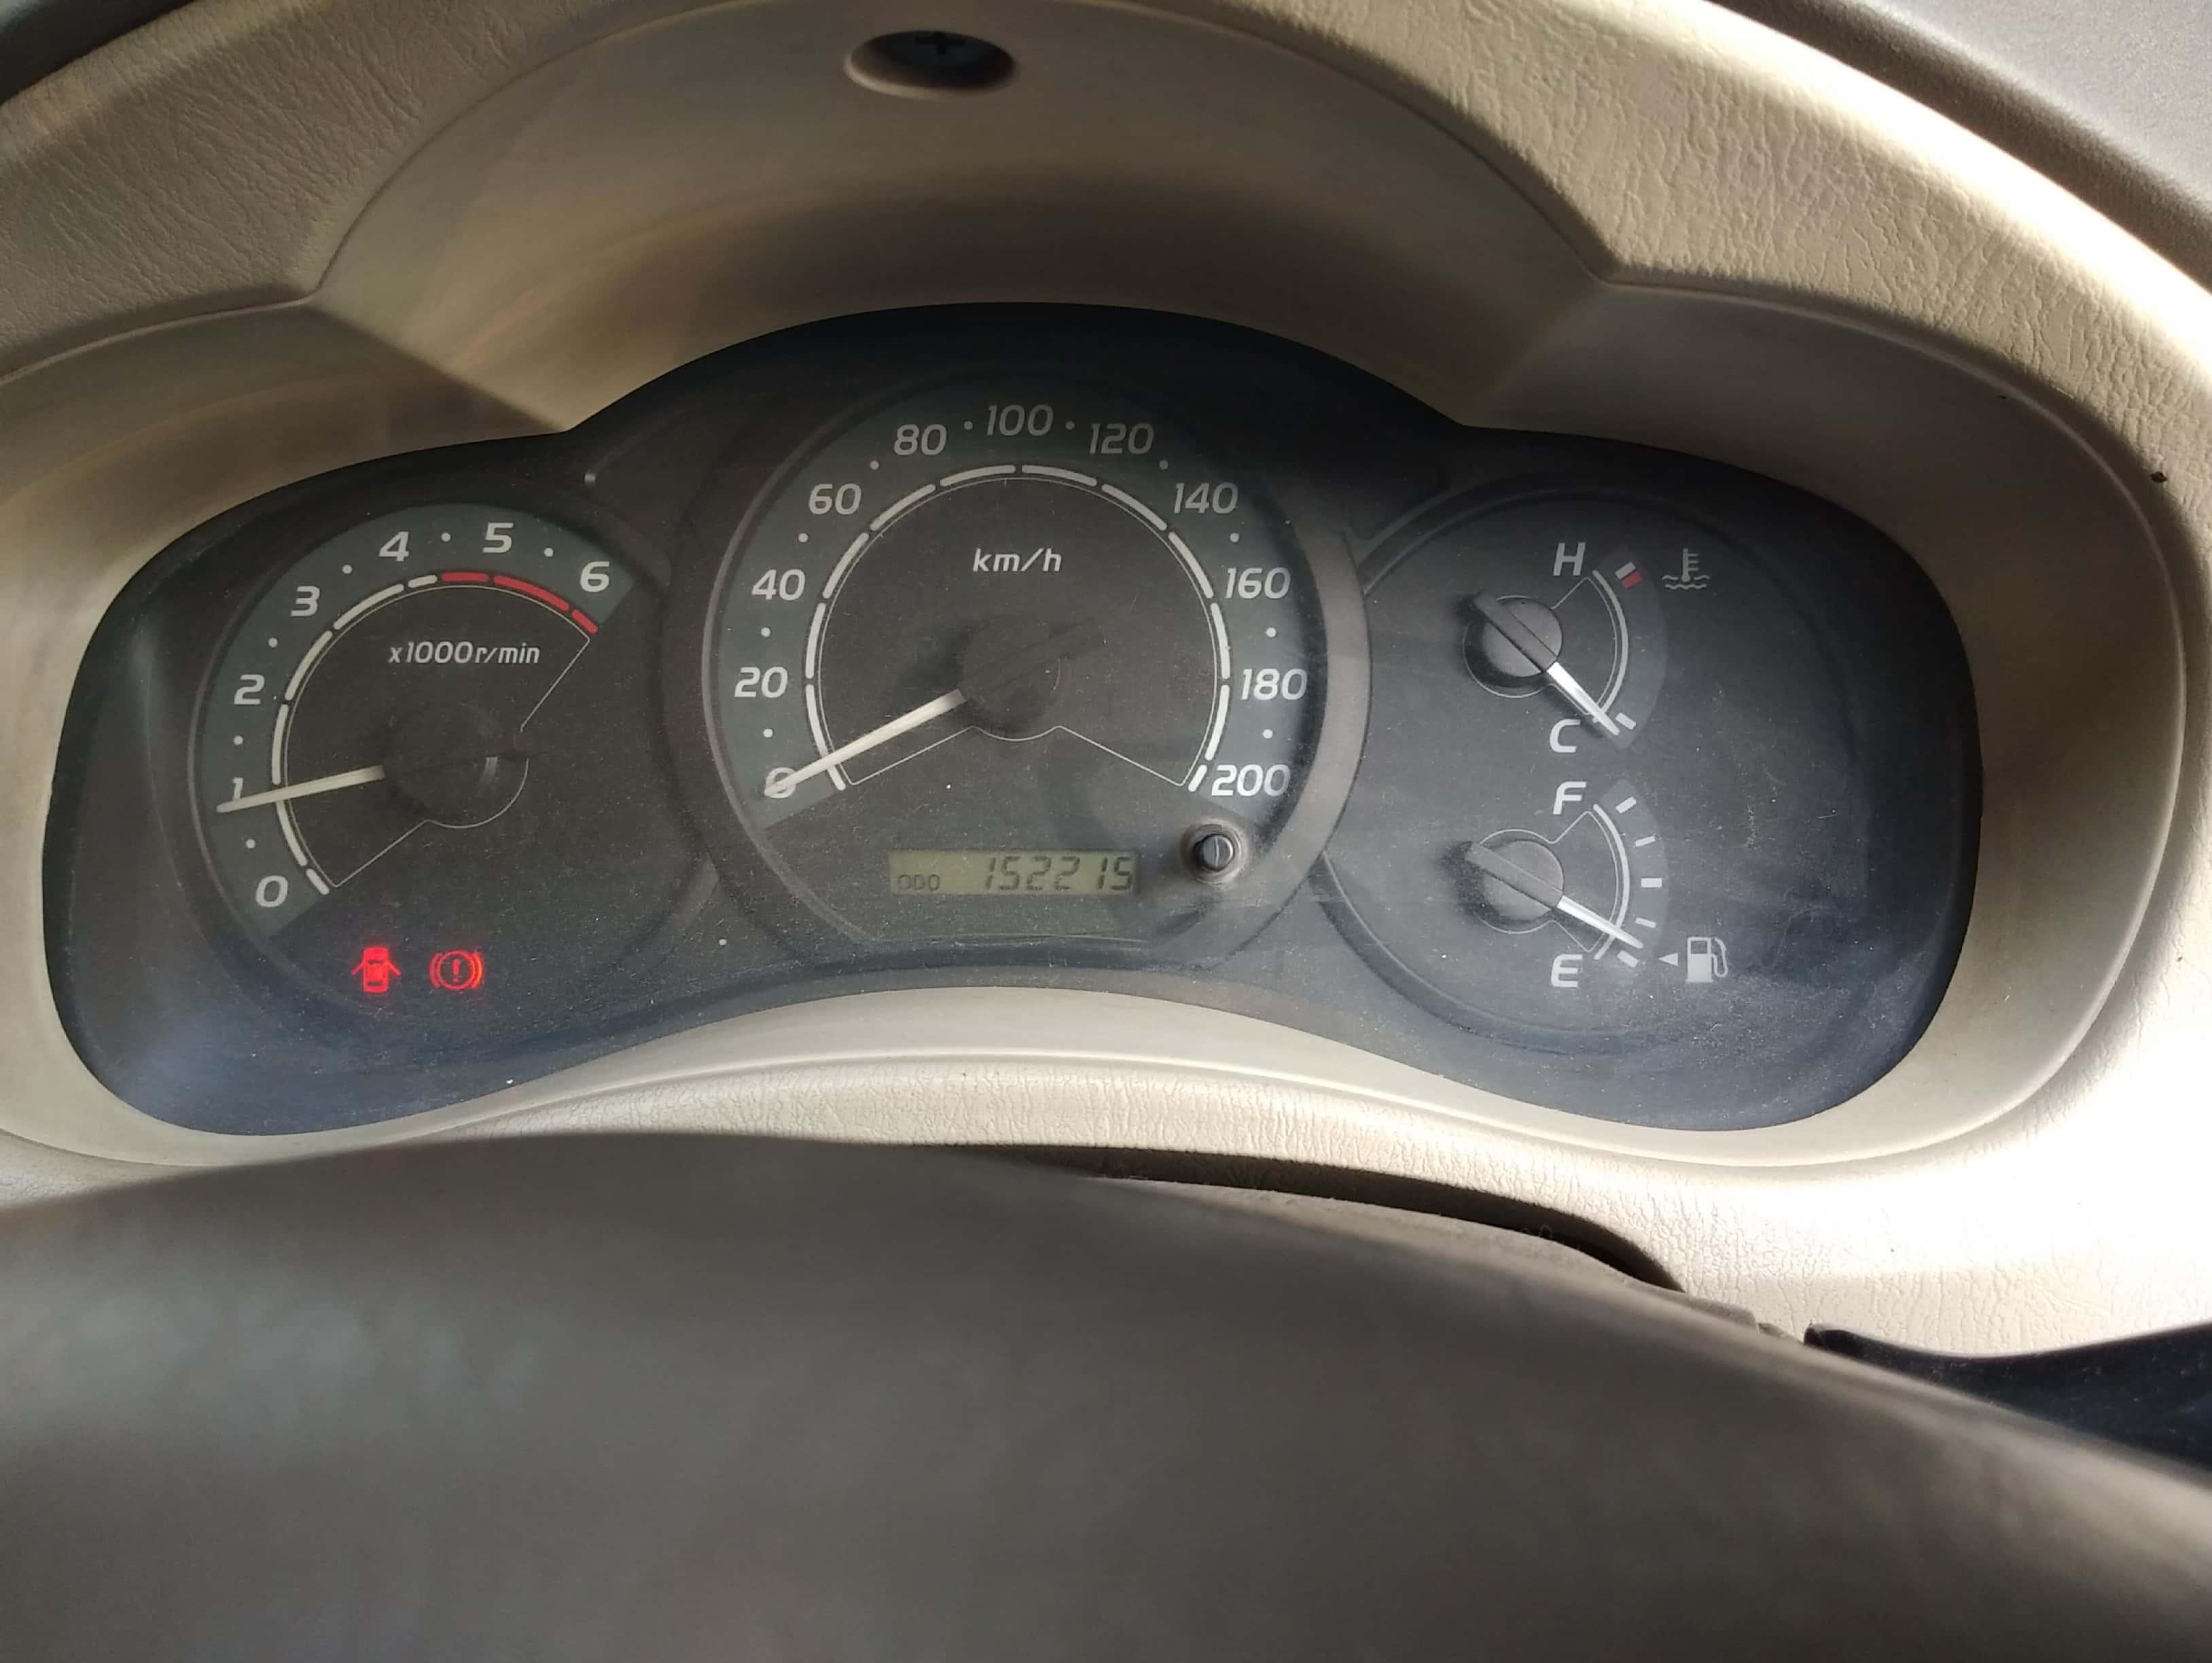 2006 Used Toyota Innova 2.5 G4 7 STR